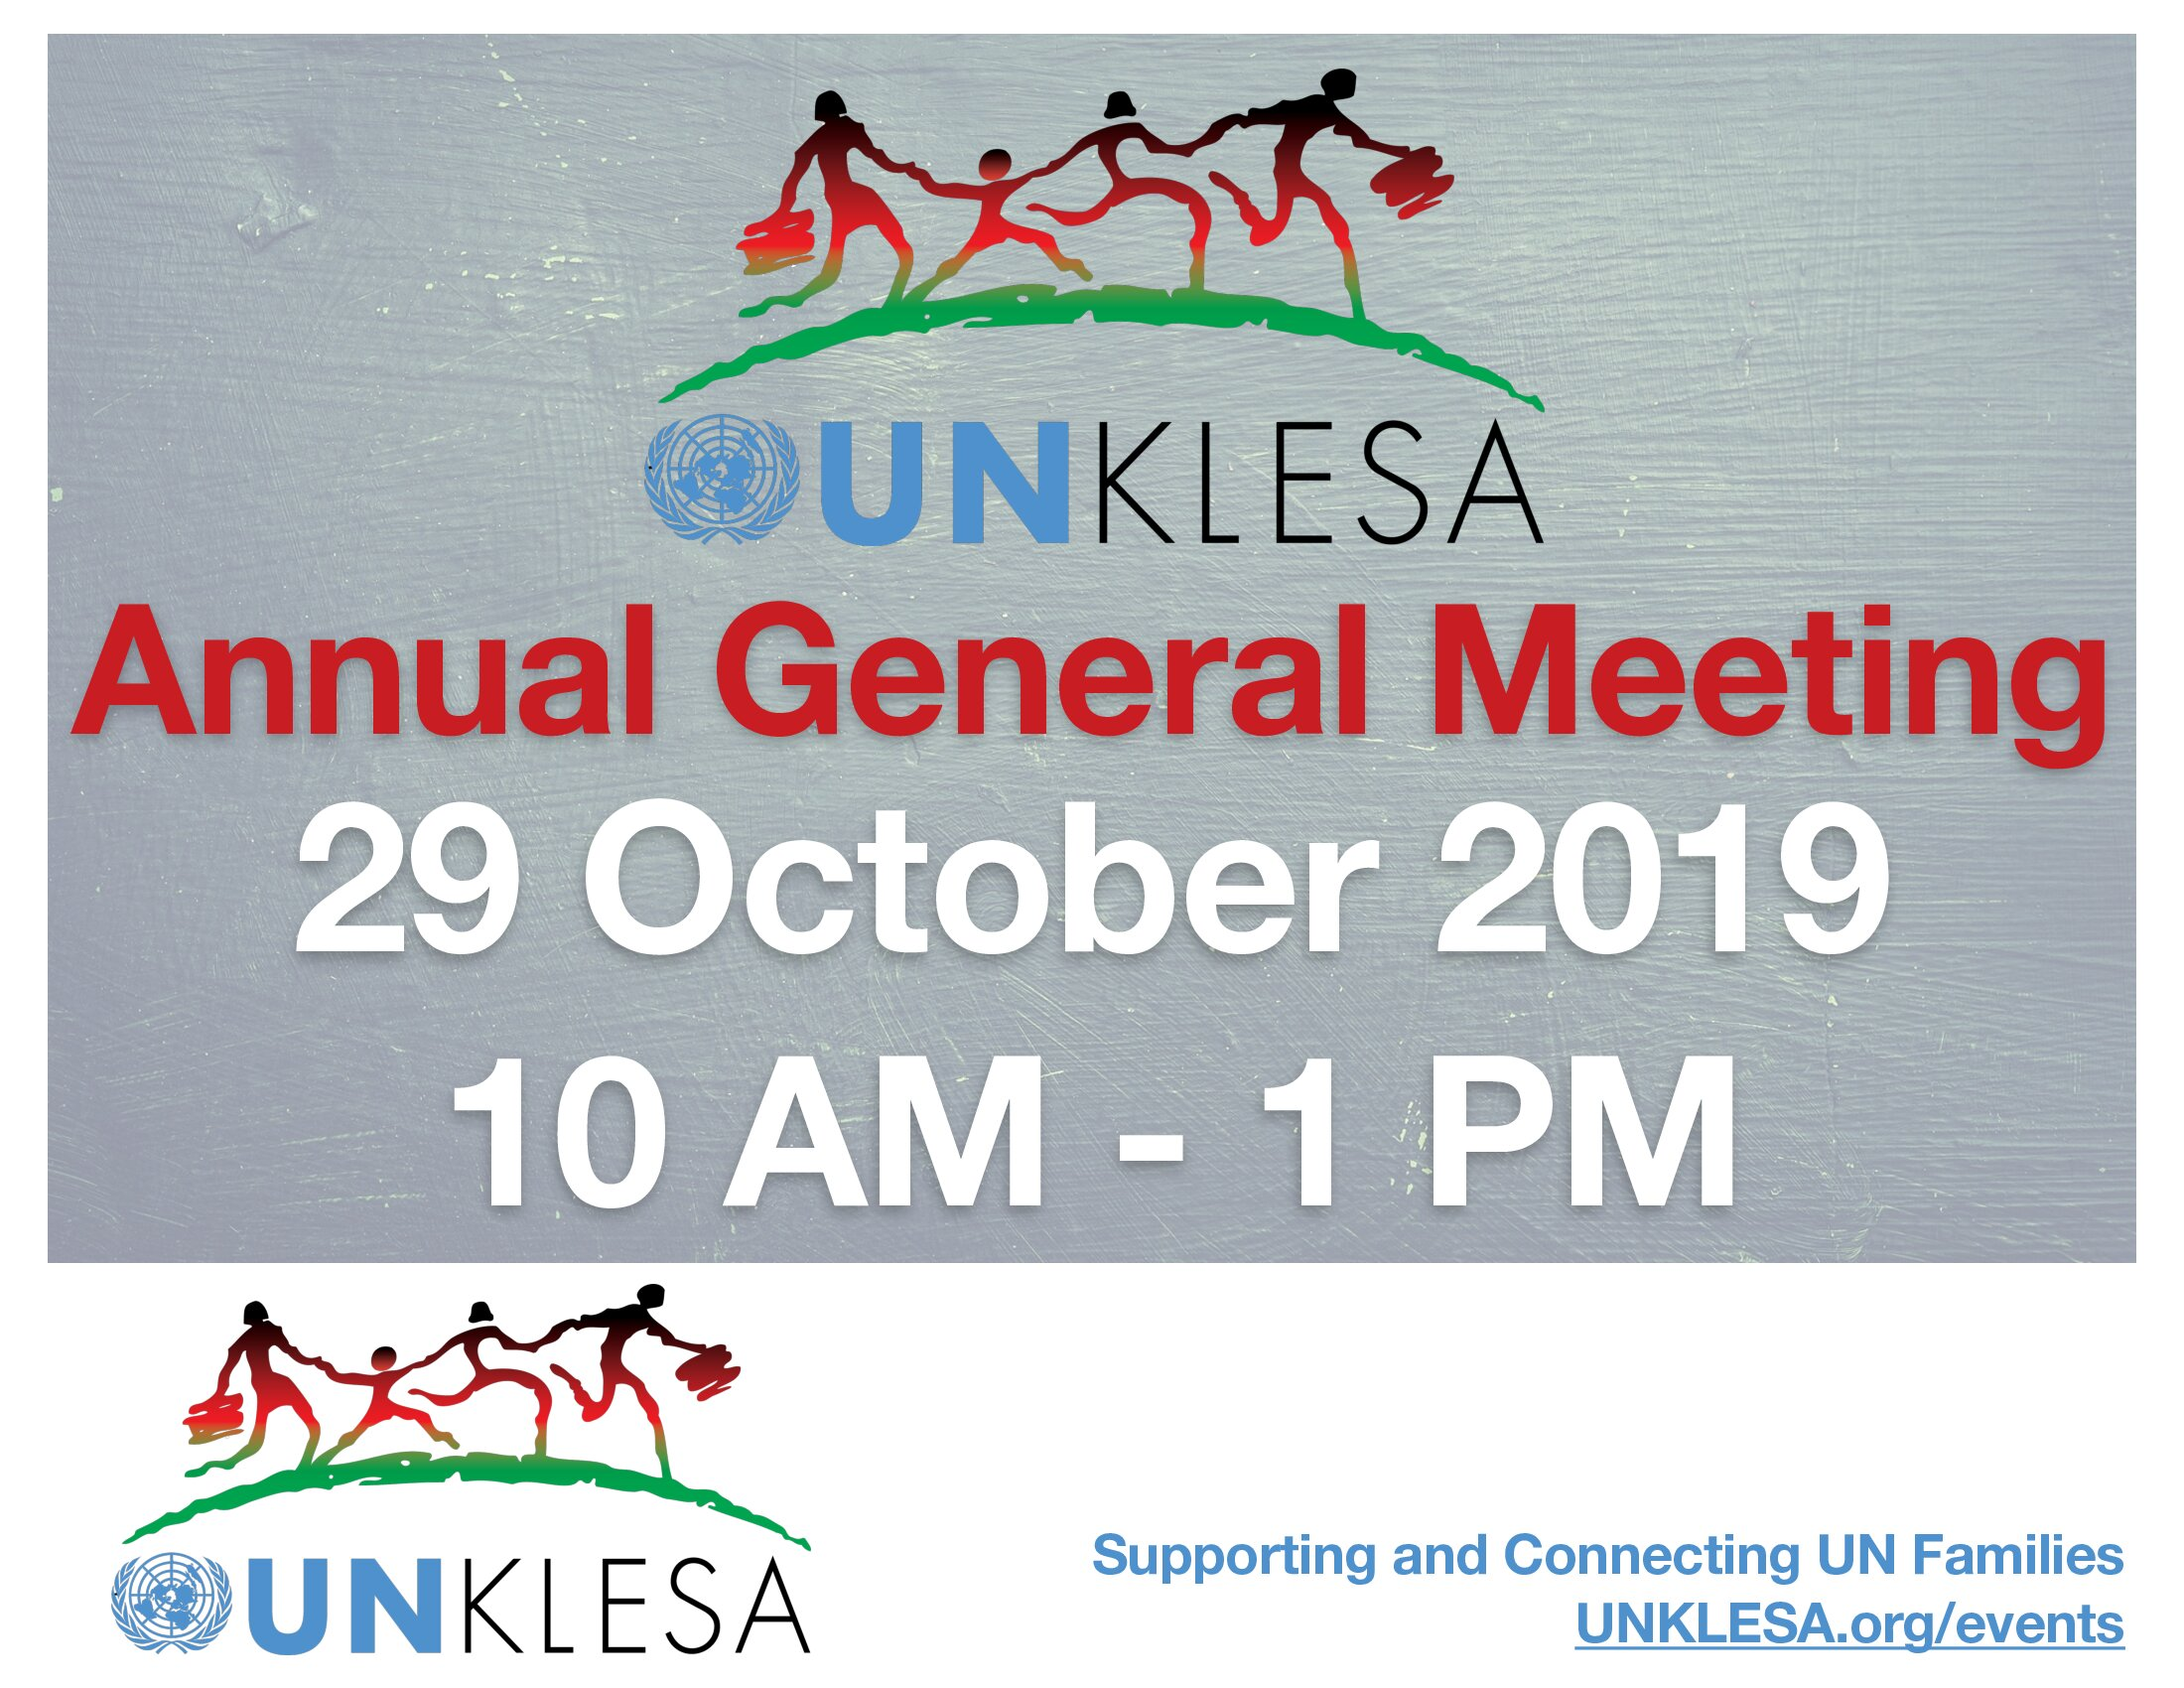 UNKLESA_AnnualGeneralMeeting_2019_TN-1.jpg